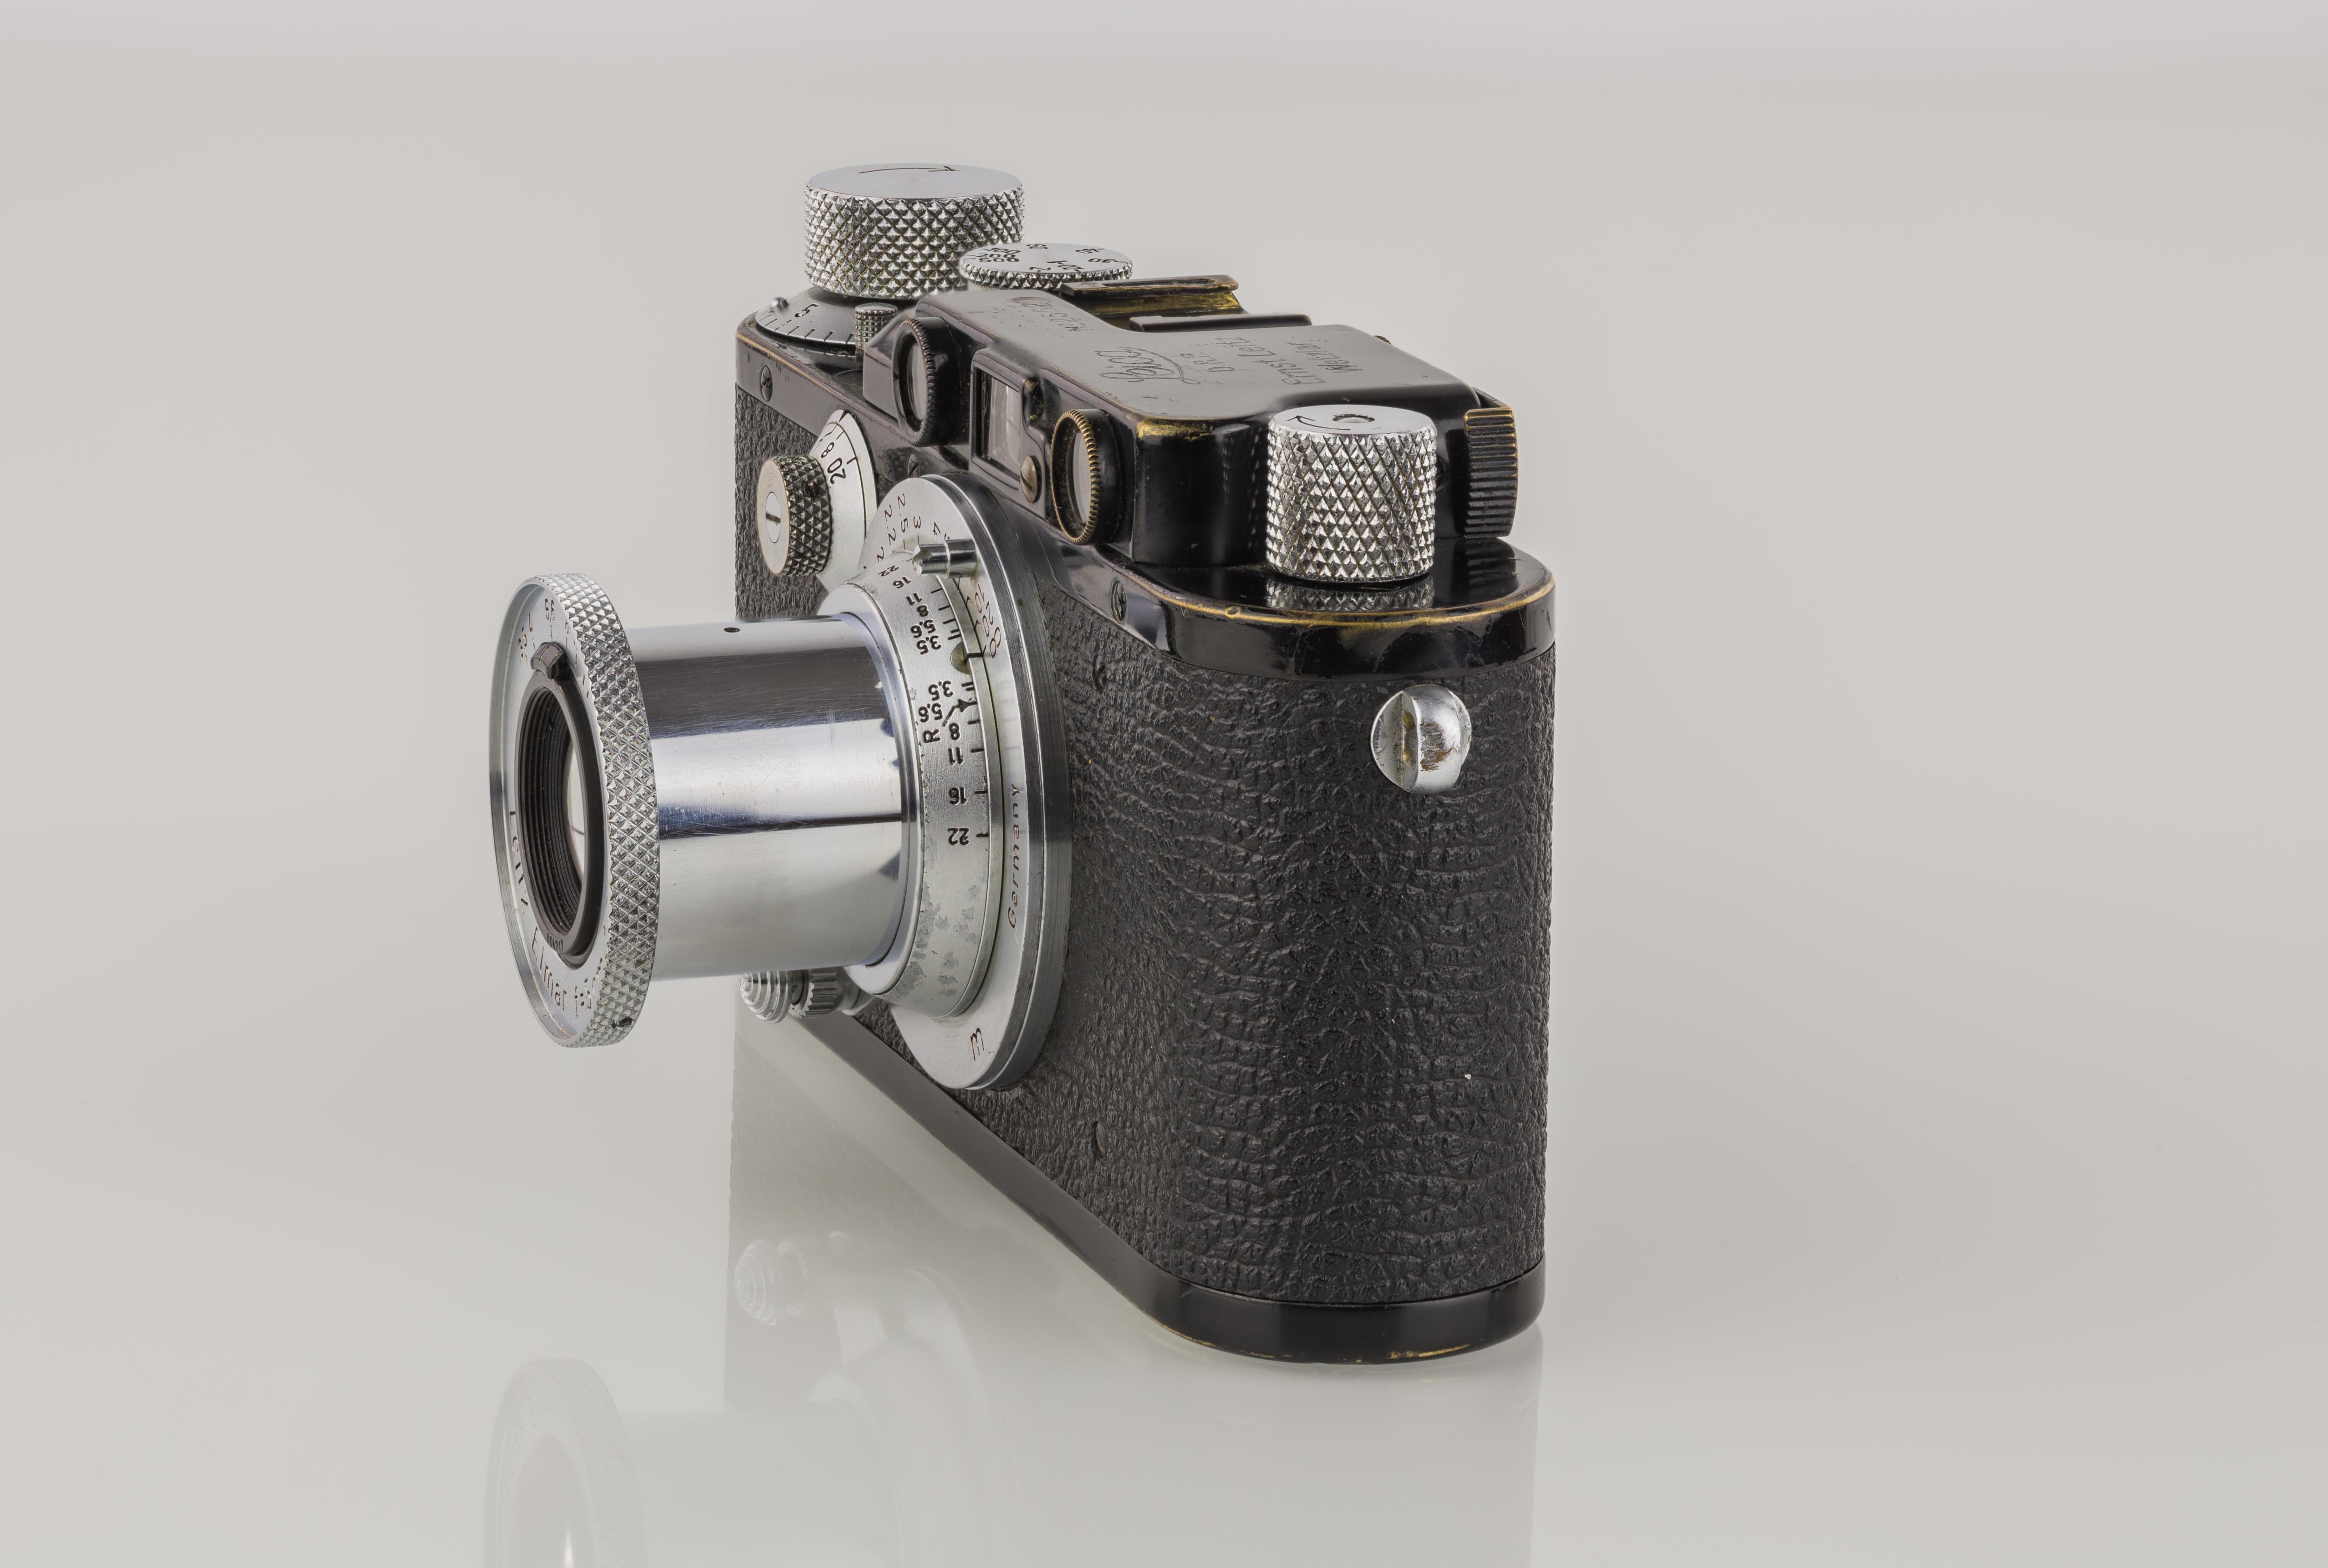 Filelei0221 199 Leica Iii Schwarz Umbau Von I Sn 25629 1930 Model Ford Electrical Wiring